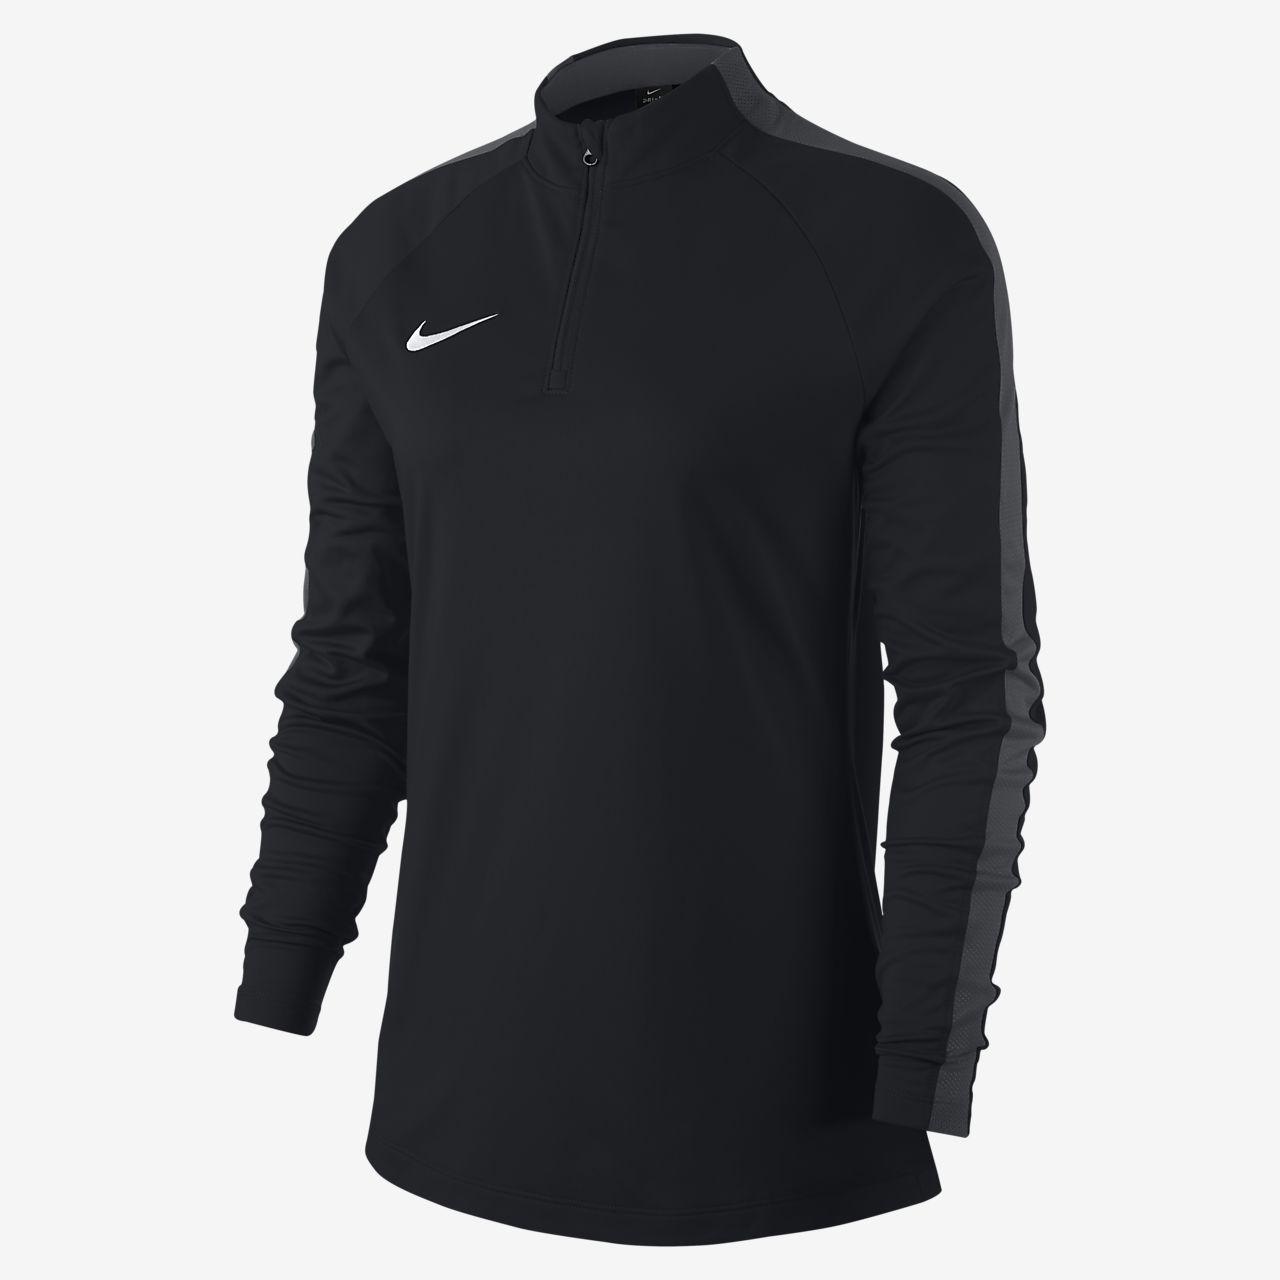 Nike Dri-FIT Academy Drill hosszú ujjú női futballfelső